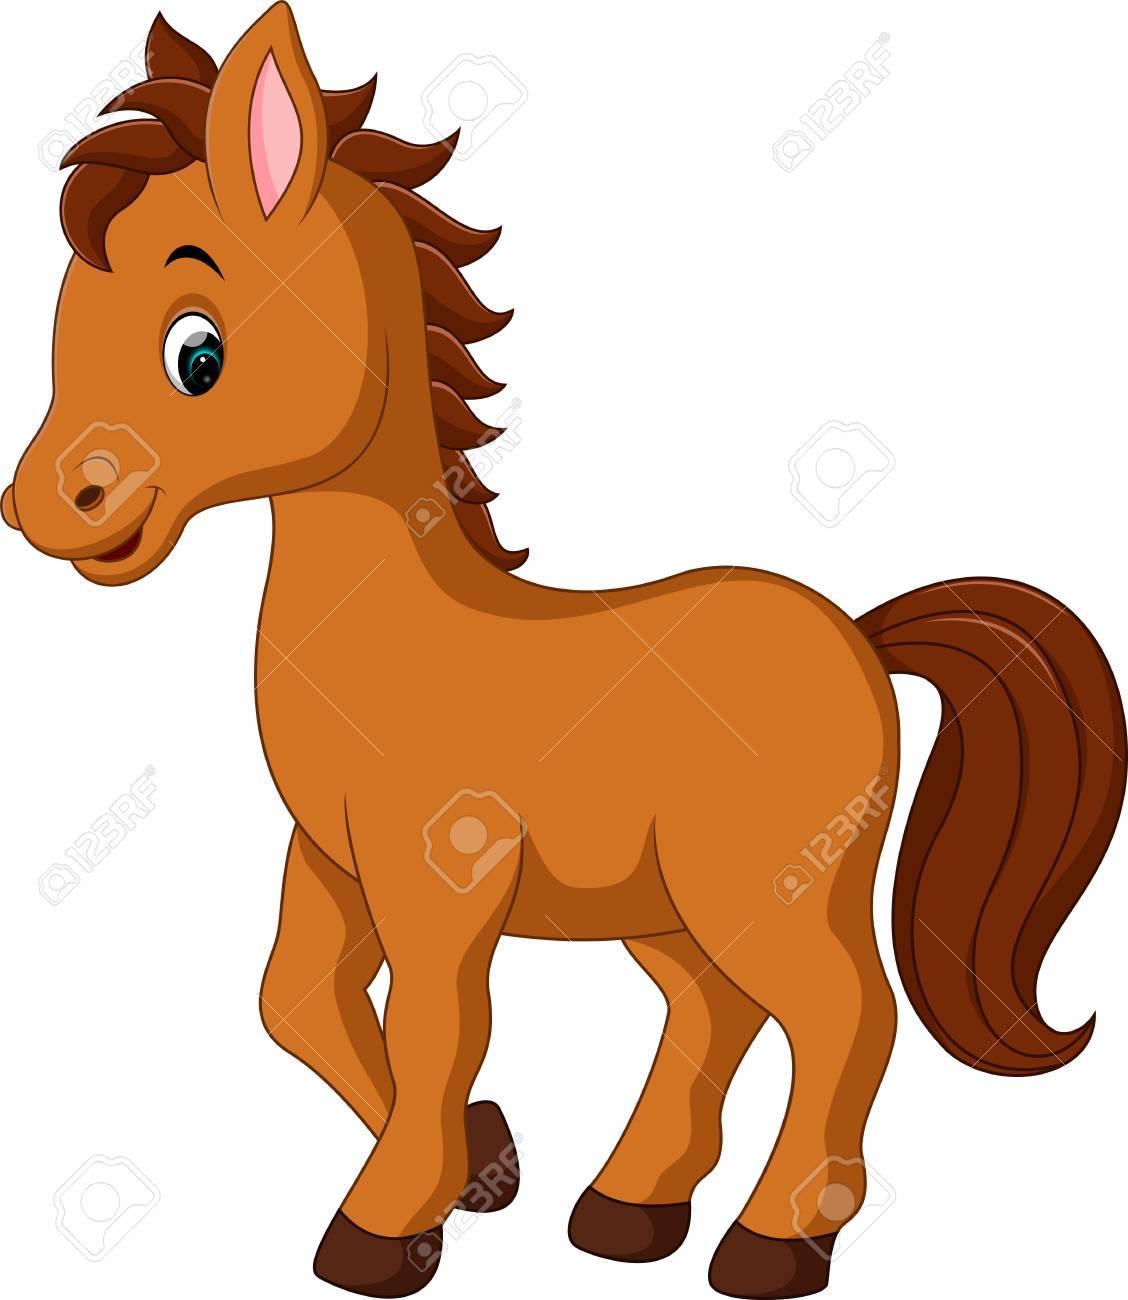 Cartoon horse clipart 7 » Clipart Station.